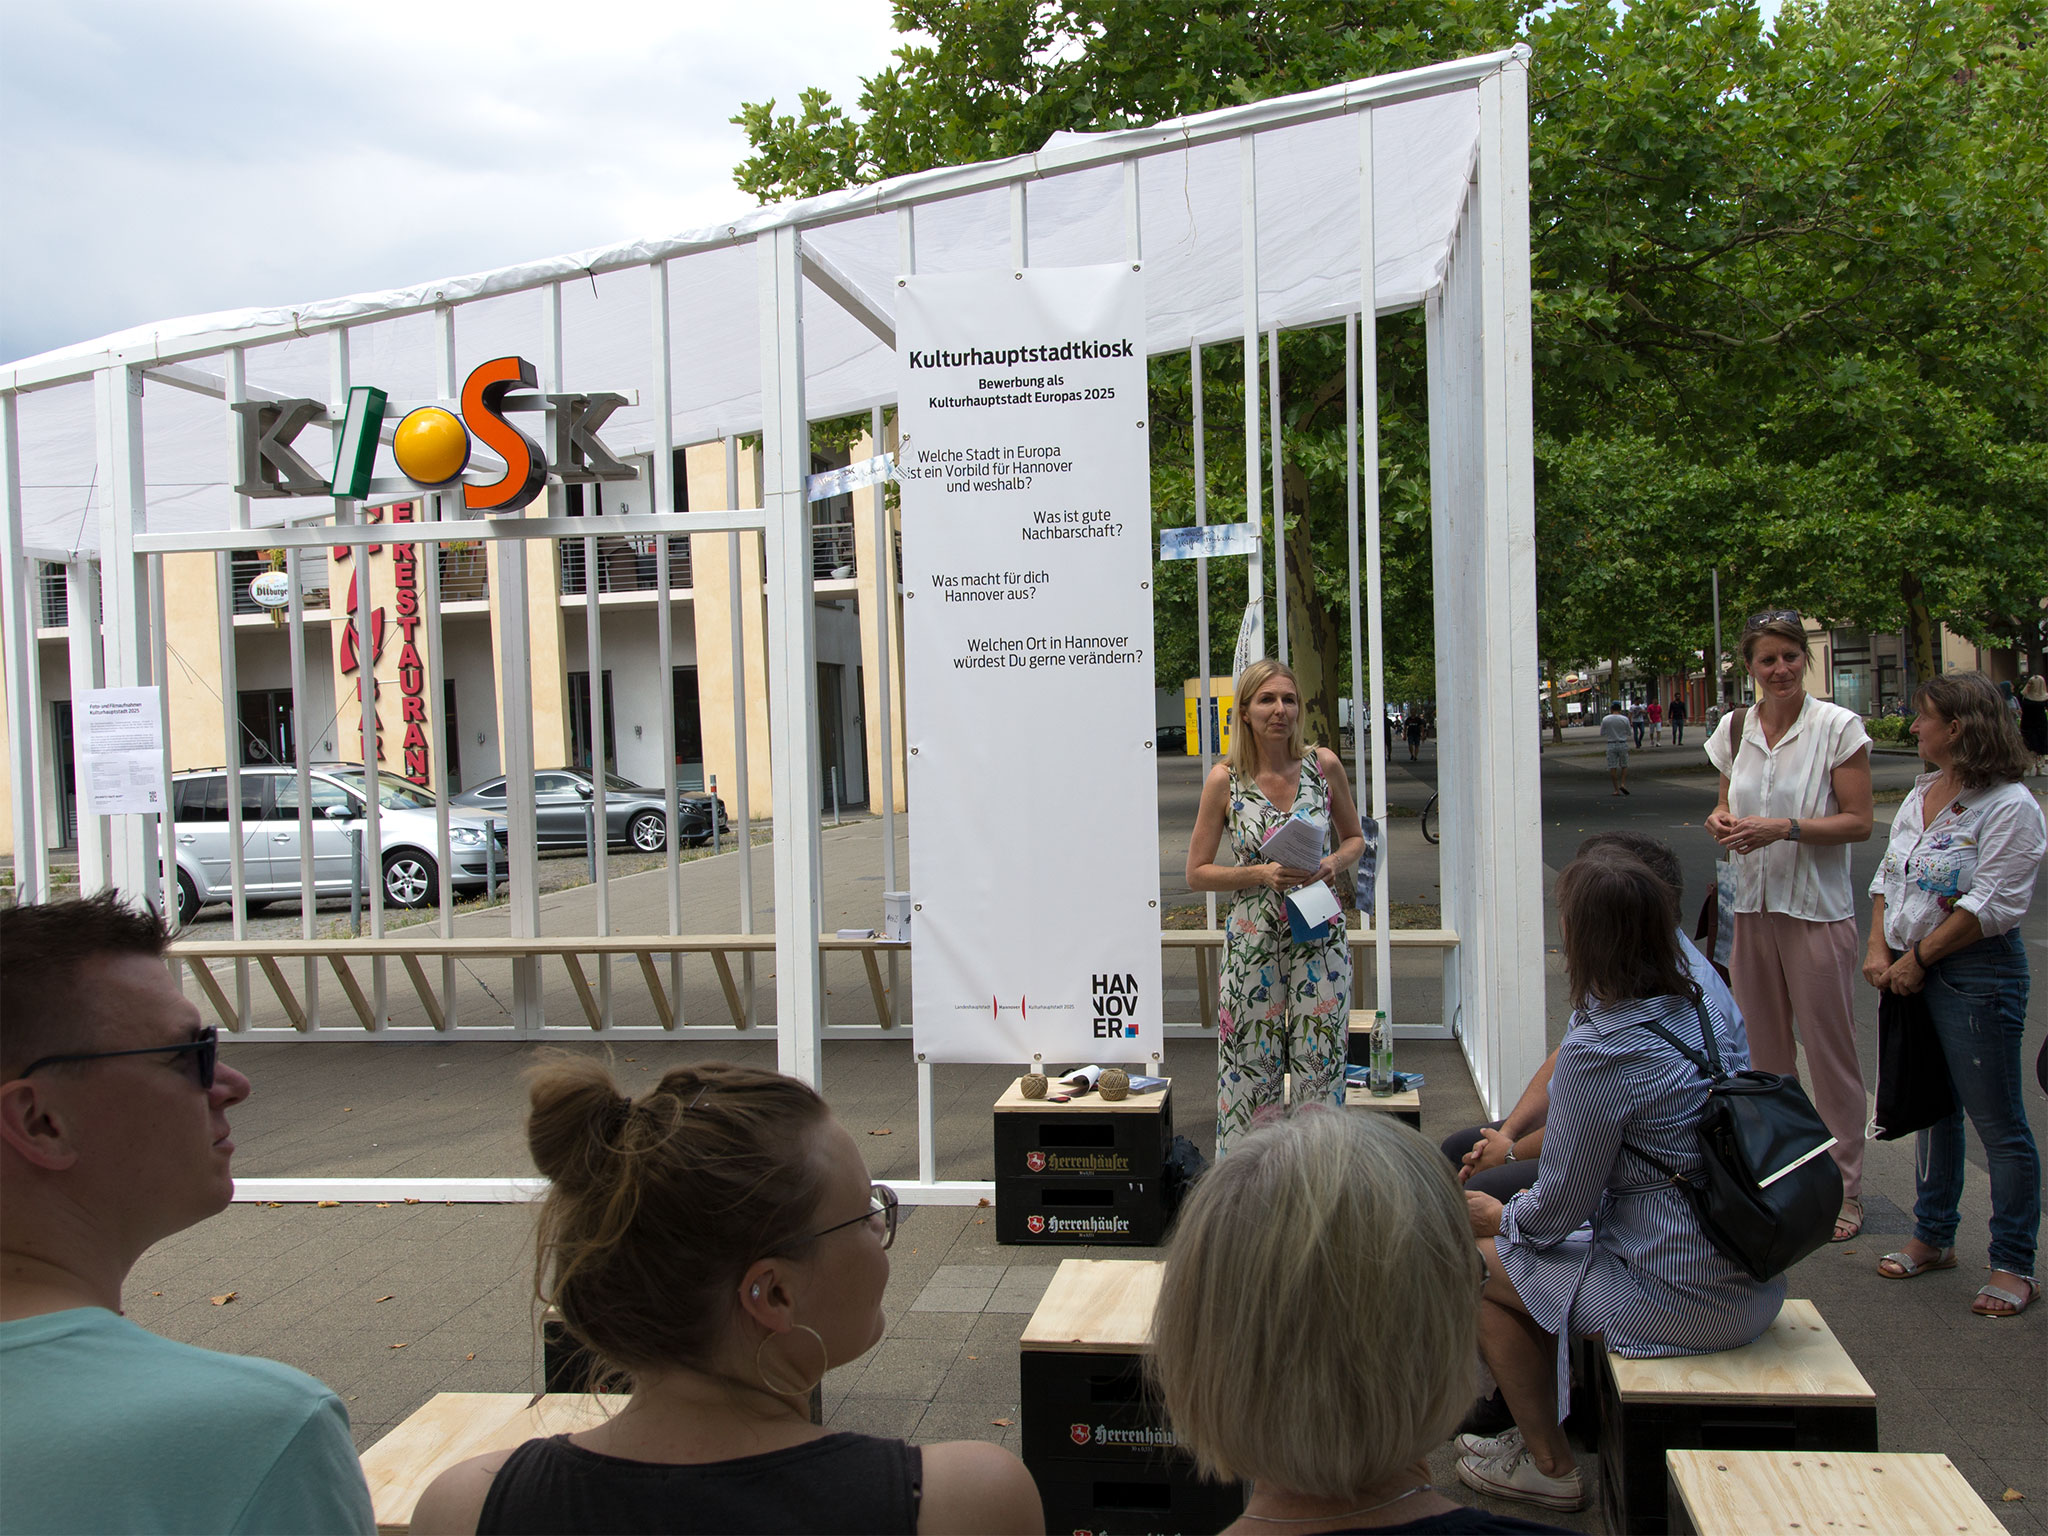 Melanie Botzki, Leiterin des städtischen Kulturhauptstadtbüros, eröffnet den Kulturhauptstadtkiosk.